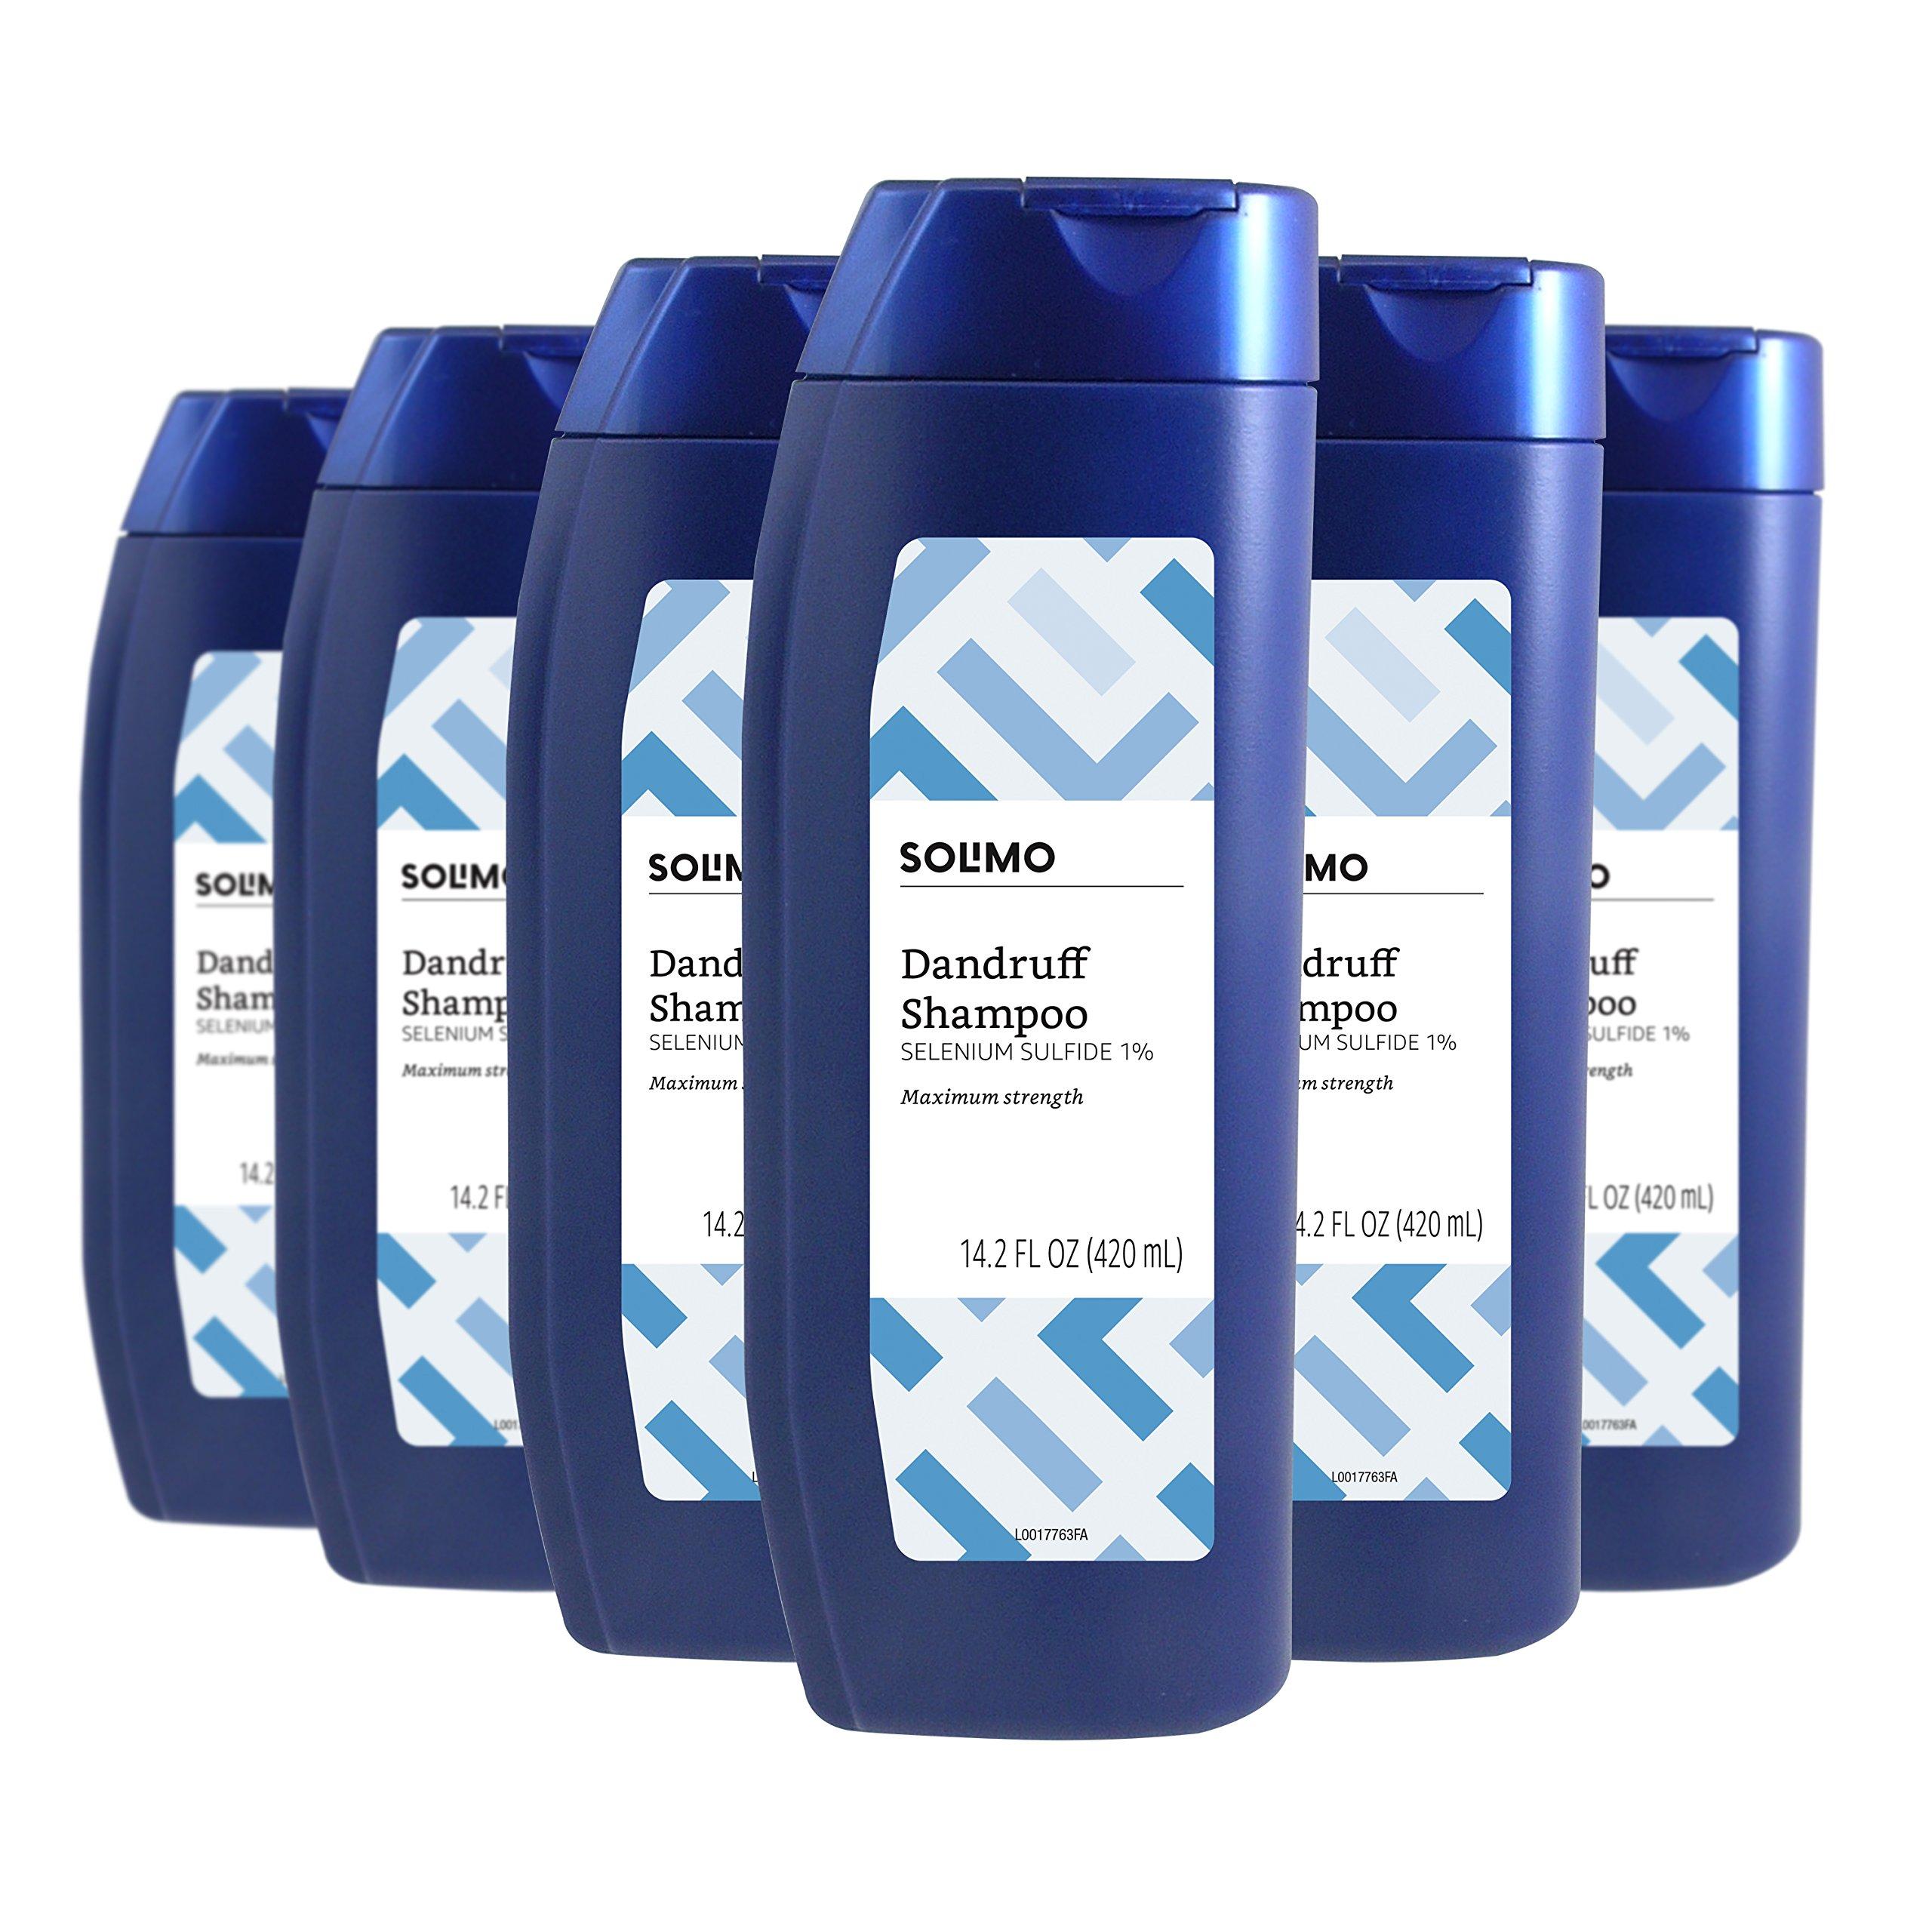 Amazon Brand - Solimo Advanced Solution Dandruff & Seborrheic Dermatitis Shampoo, Maximum Strength, 14.2 Fluid Ounce (Pack of 6) by Solimo